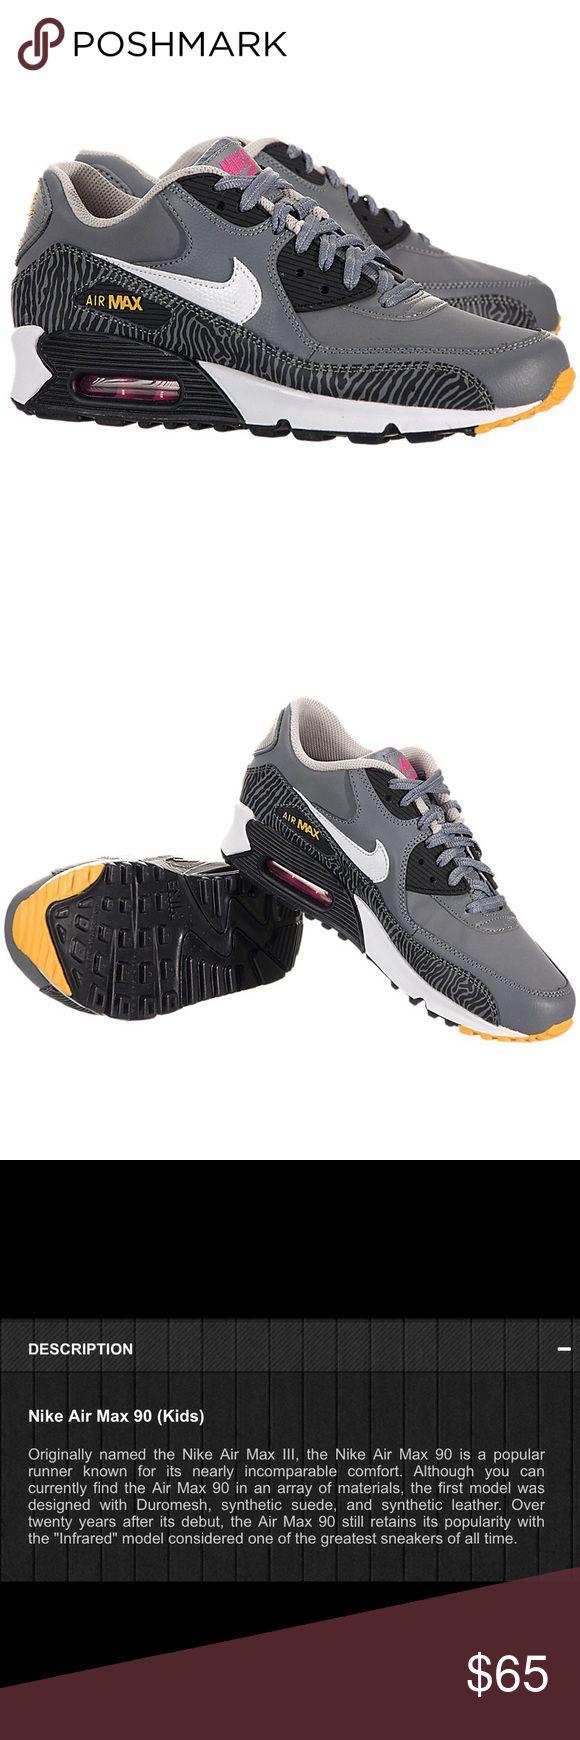 Nike Air Max 90 Size 7 boys or 81/2 girls Nike Air Max 90 zebra print EUC Nike Shoes Sneakers